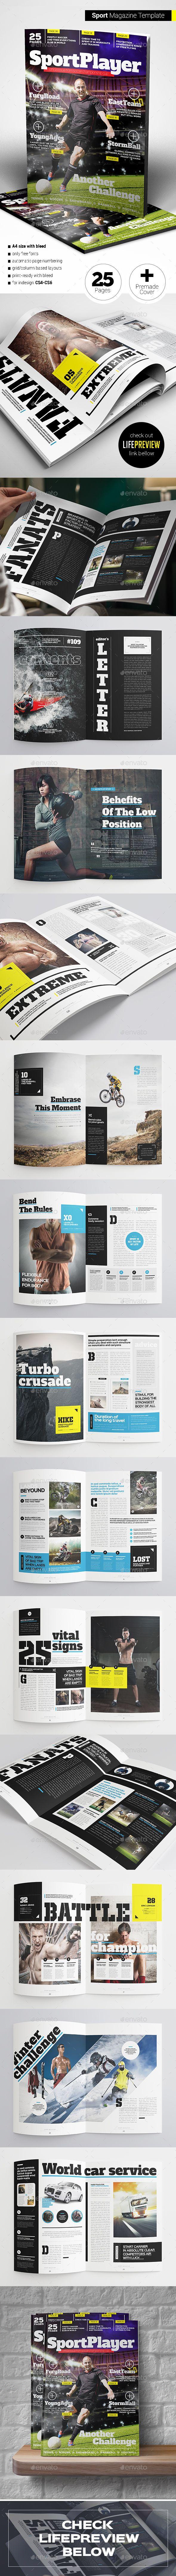 Sport Magazine Template InDesign INDD #design Download: http://graphicriver.net/item/sport-magazine/13916129?ref=ksioks